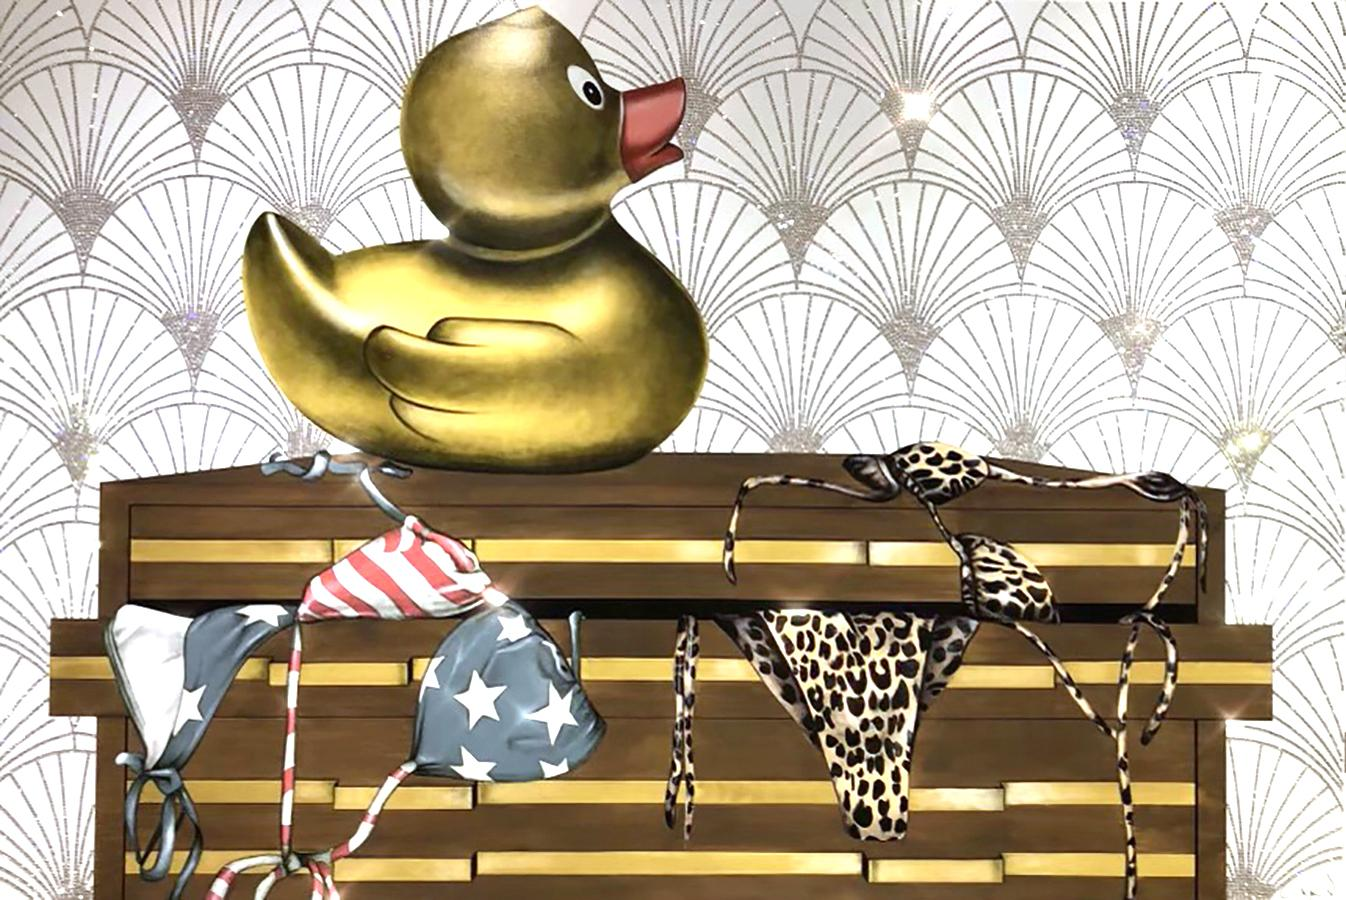 What The Duck_2021_Anja Van Herle_Acrylic/Swarovski Crystals/Panel (Disco Duck)